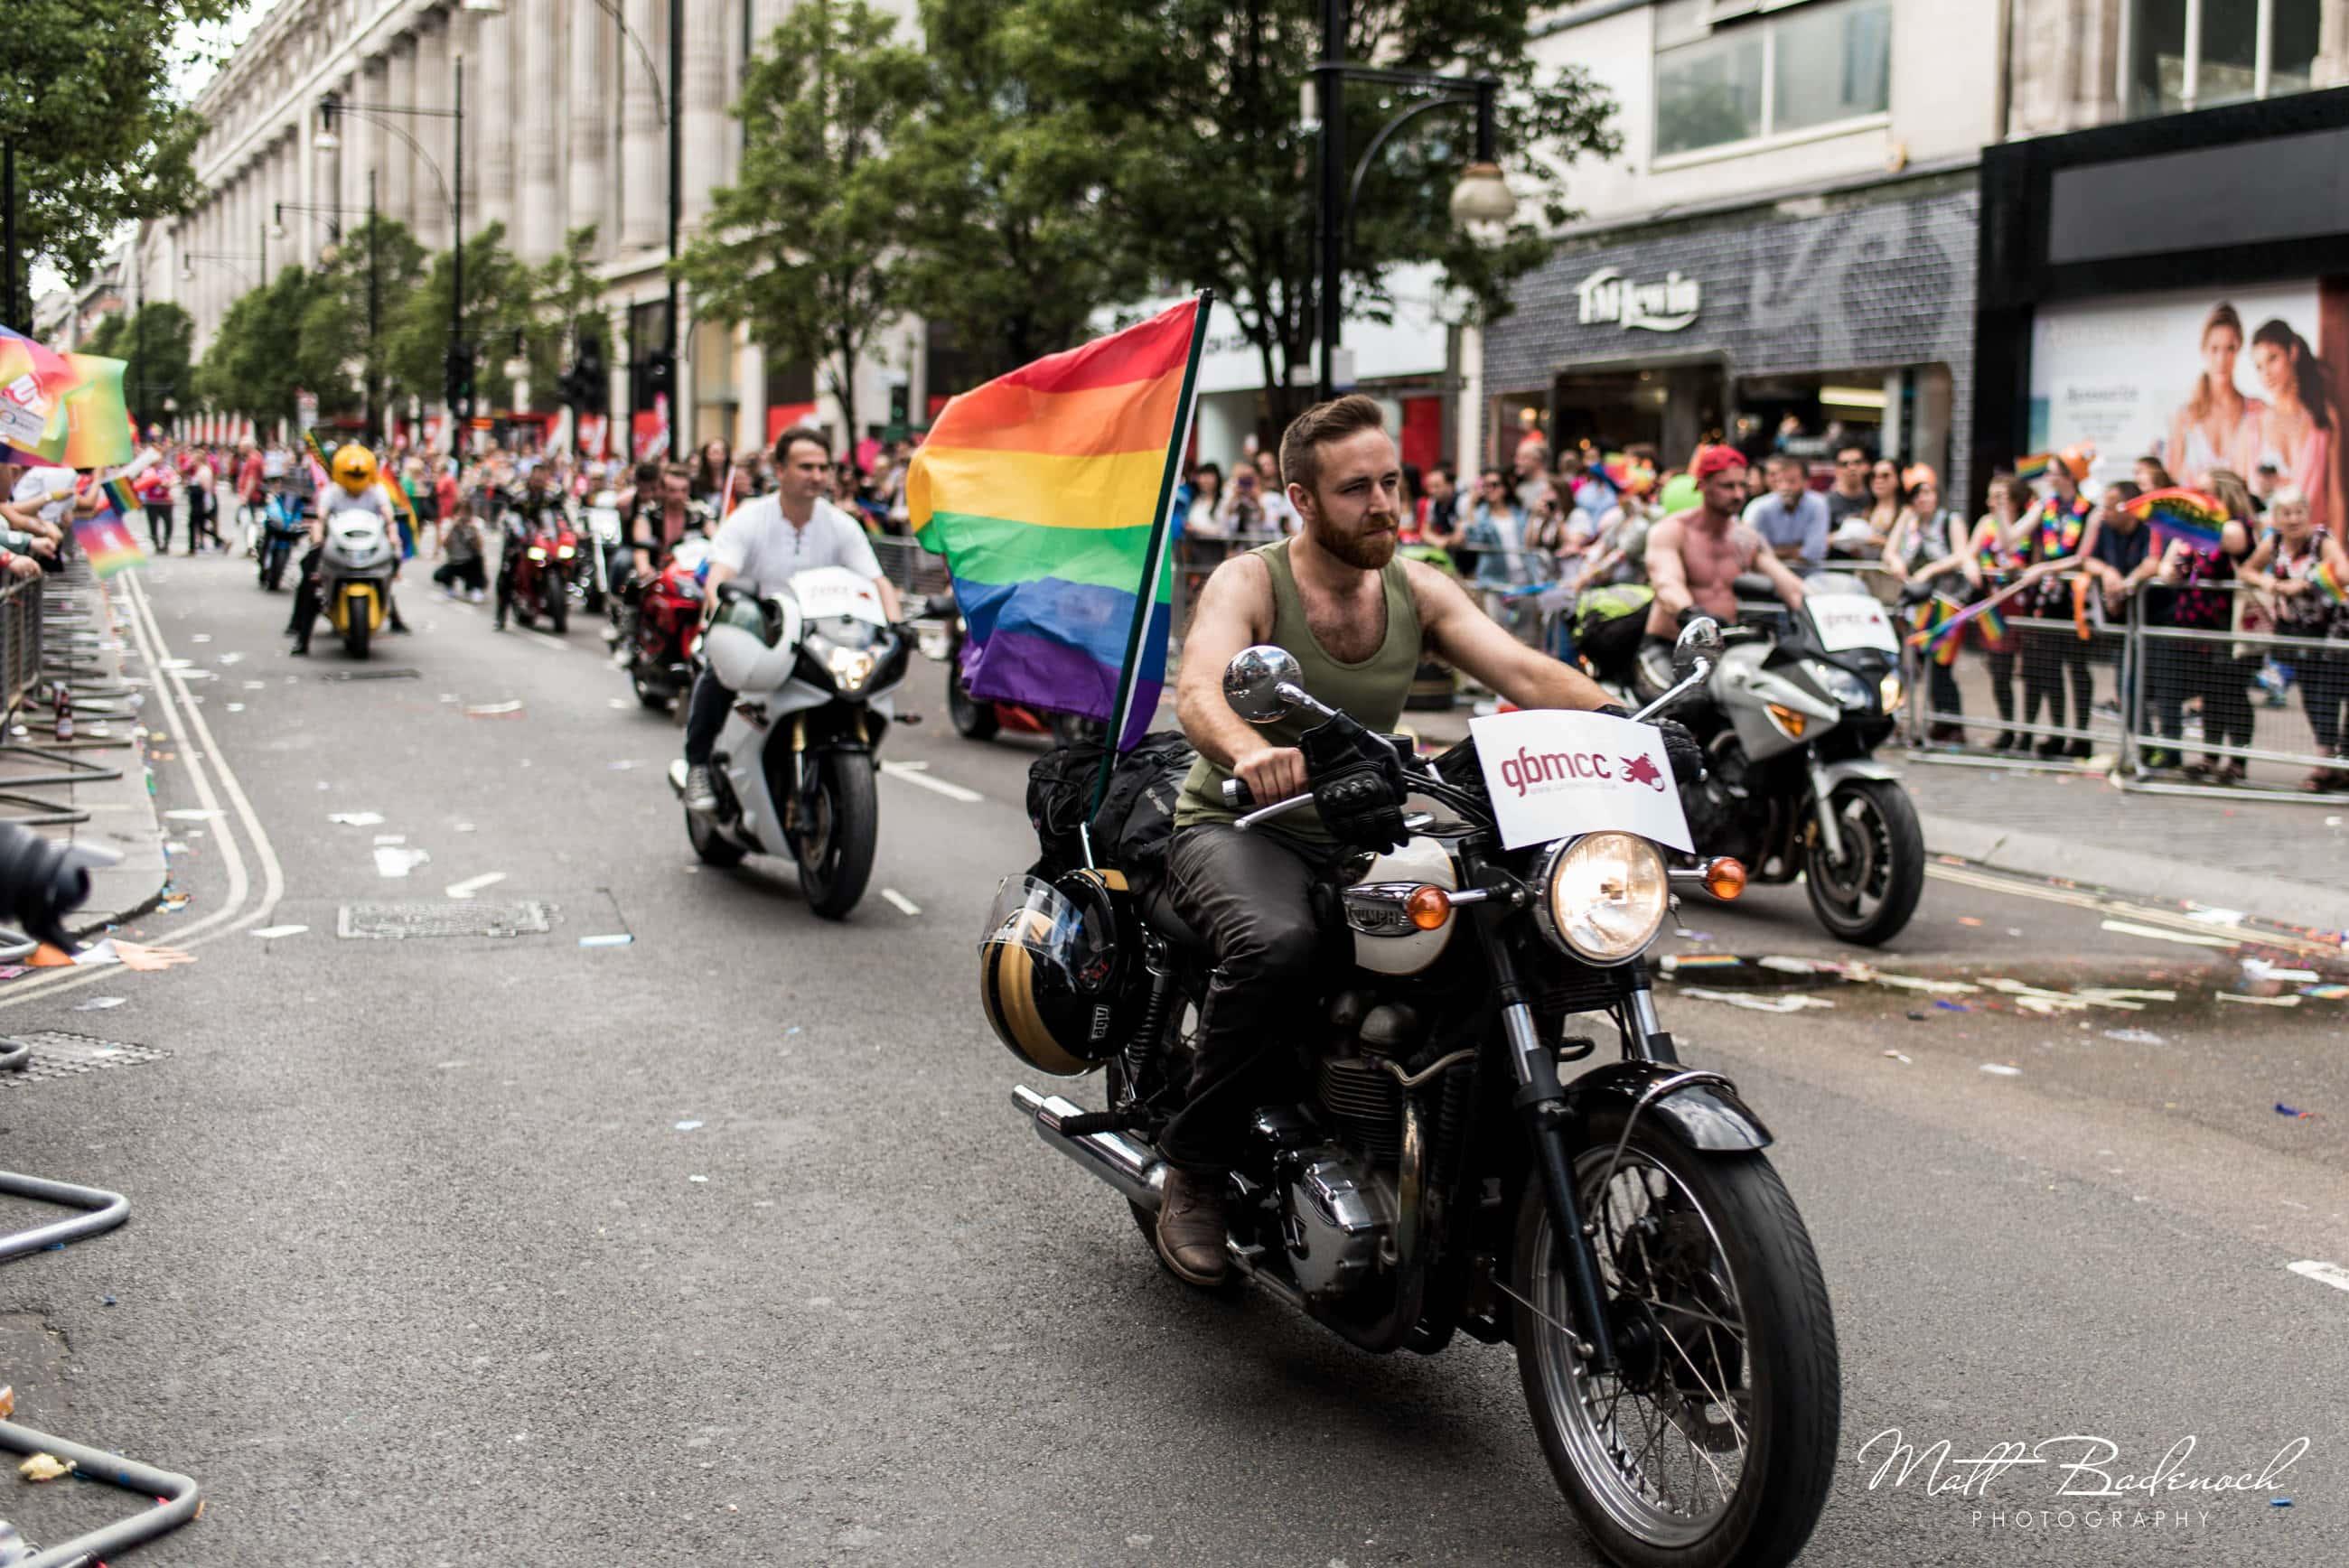 GBMCC, London Pride Parade 2015 Photos